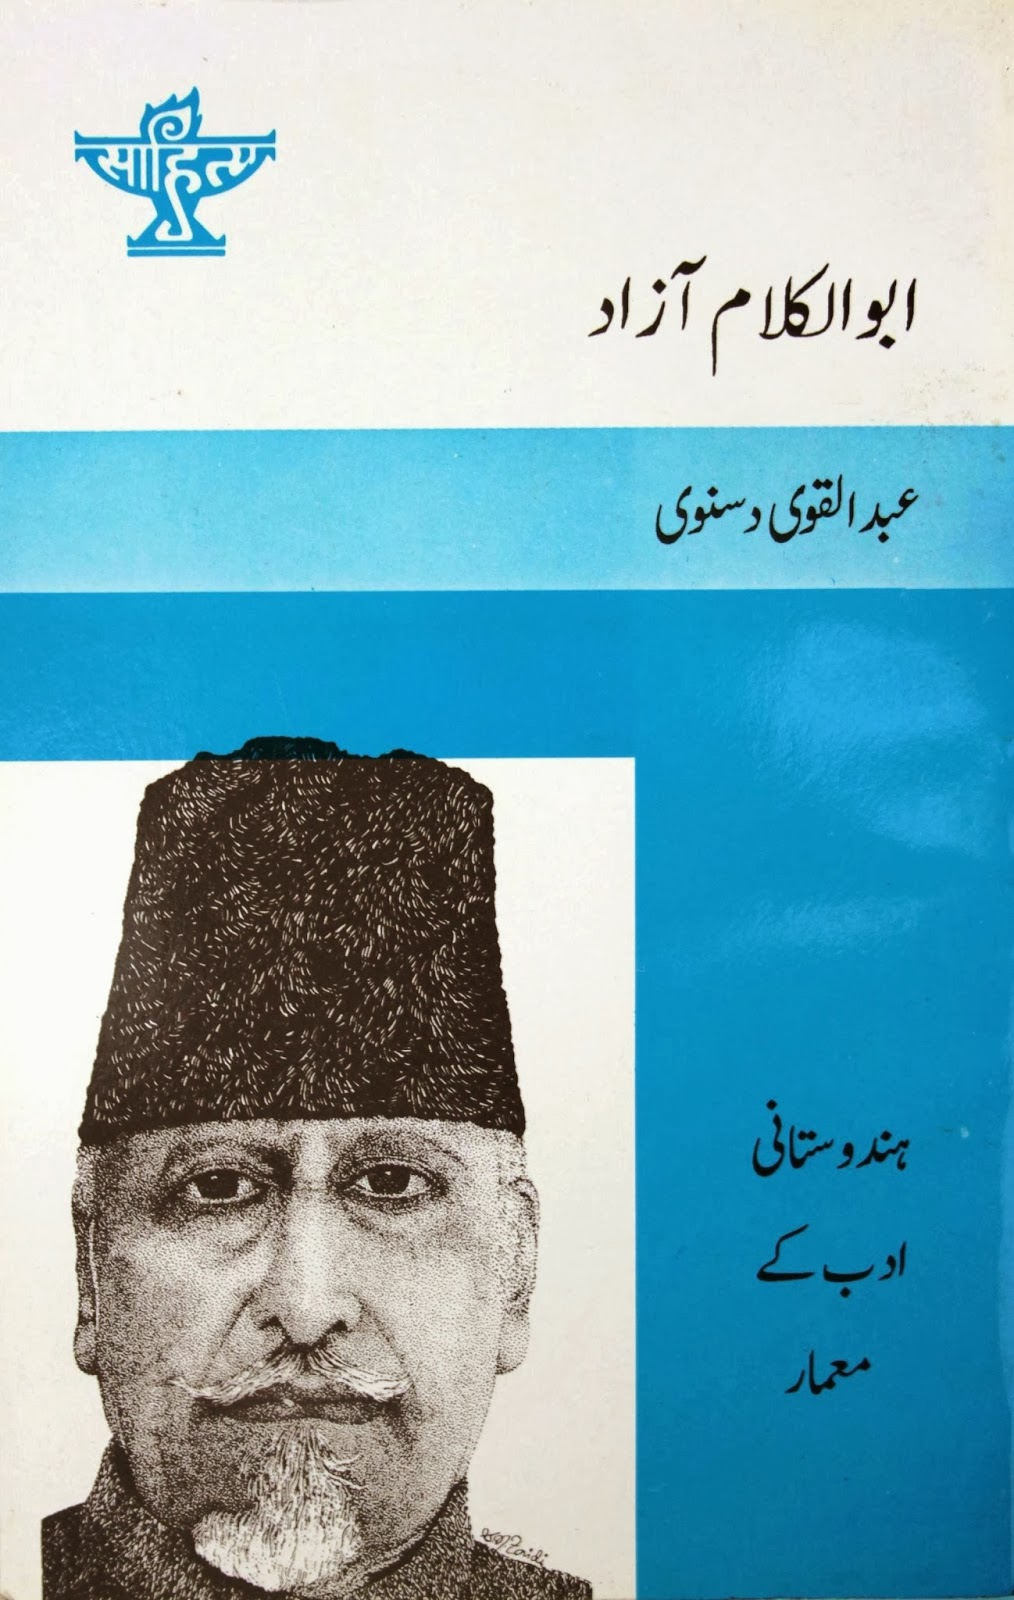 abdul kalam azad Abdul kalam, failure to success: learn english (ind) - story for children bookboxcom molana abulkalam azad indian first educational minister best speech hindi urdu languages.